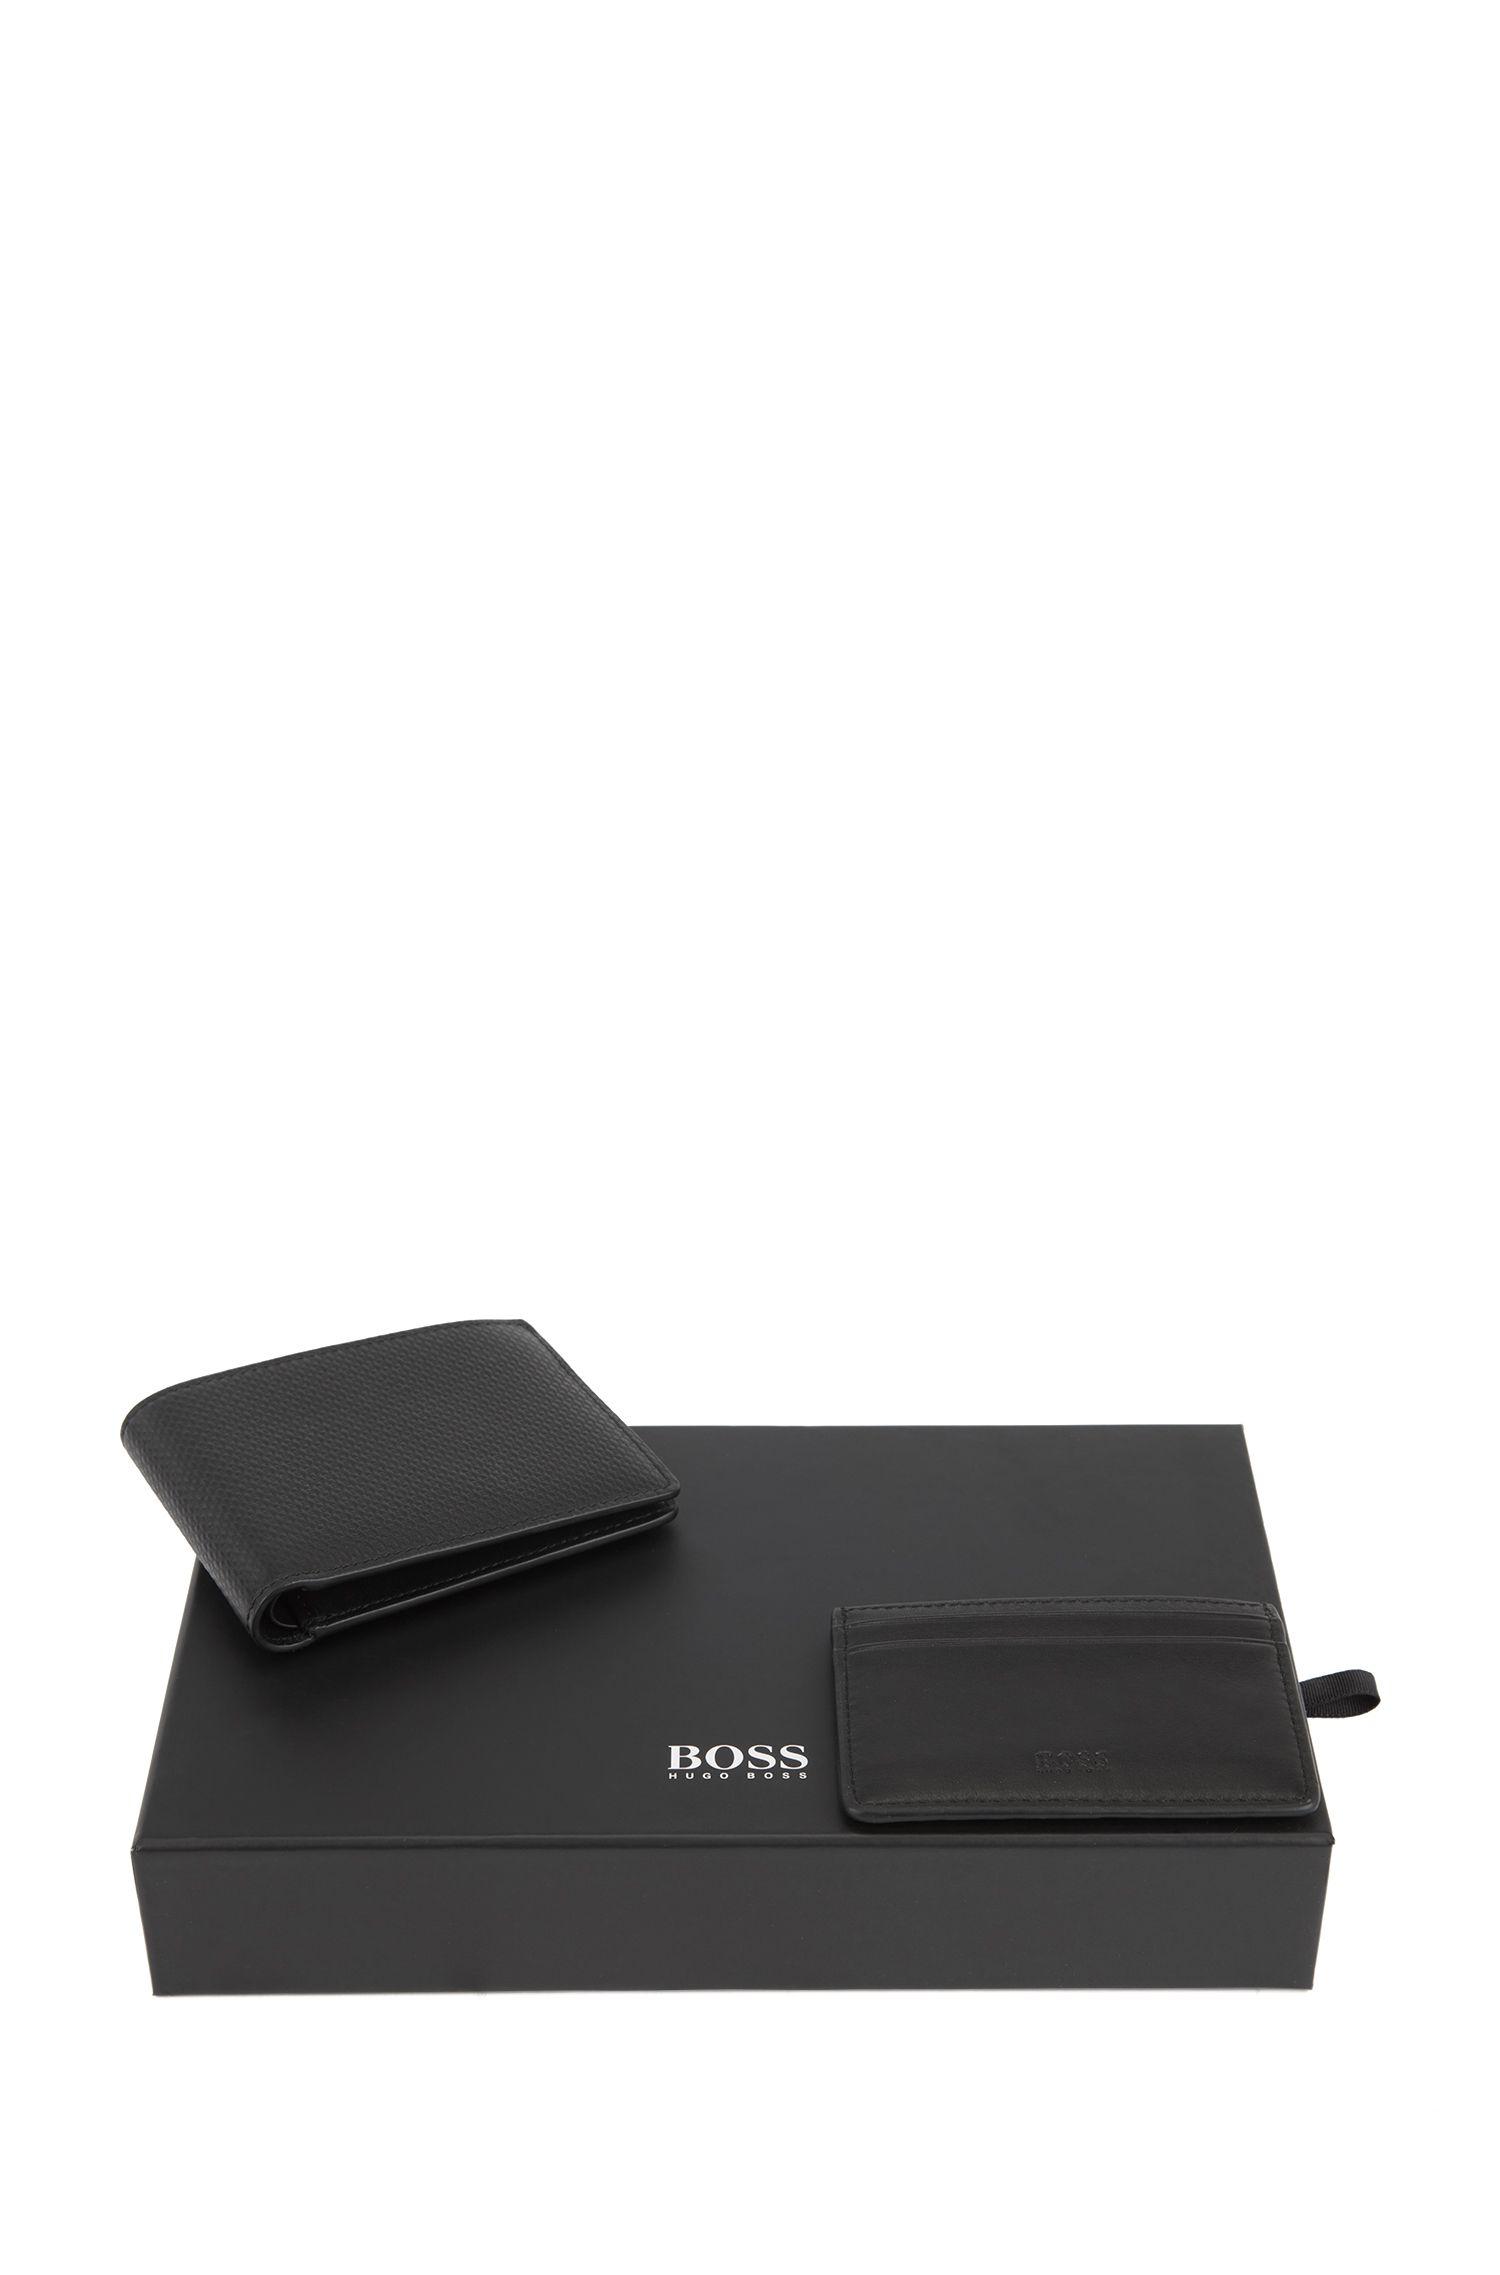 Monogram-embossed leather wallet and card holder gift set, Black